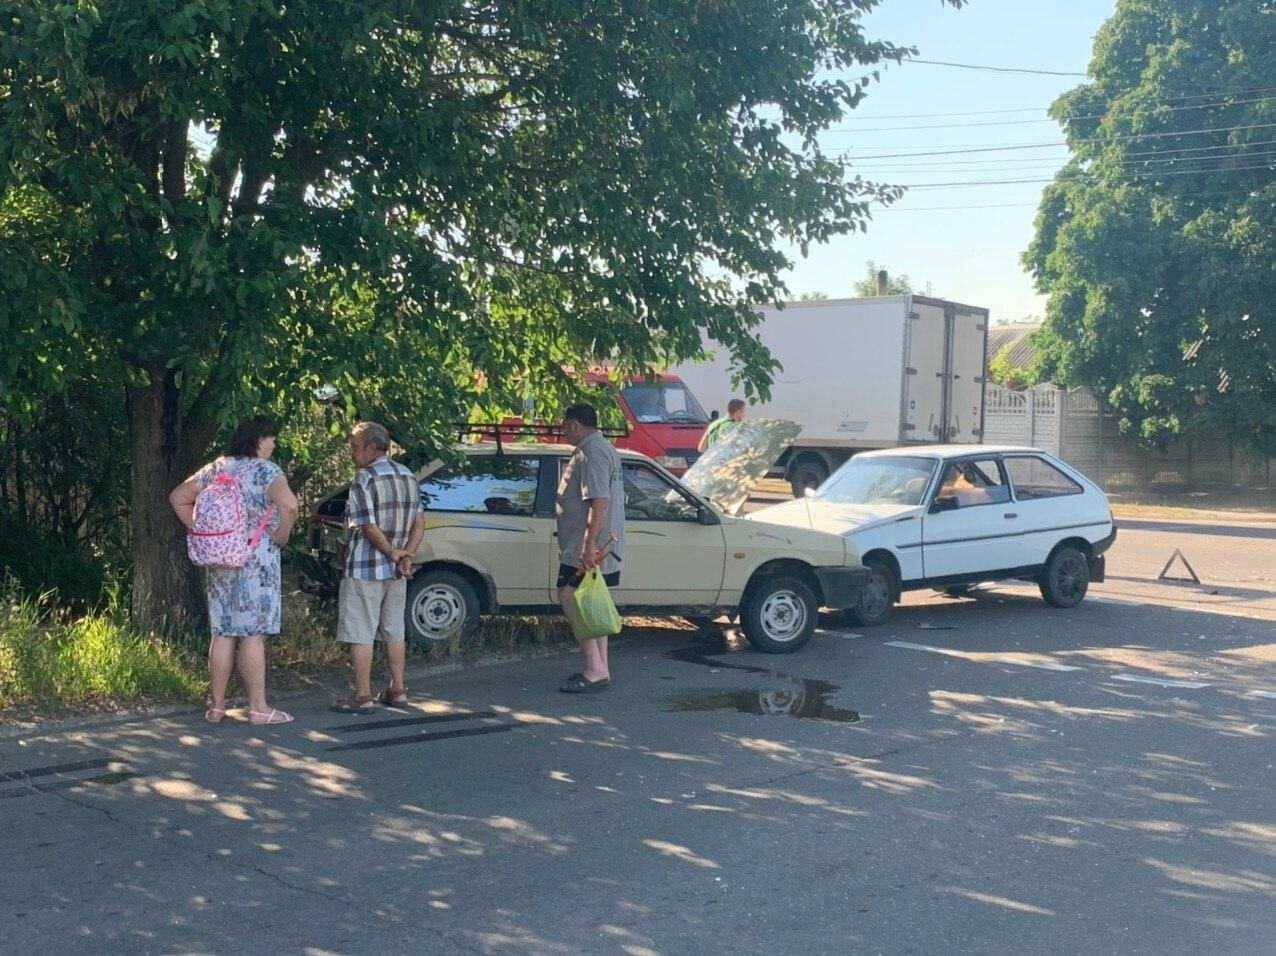 В Бердянске лбами столкнулися две машины, - ФОТО, фото-1